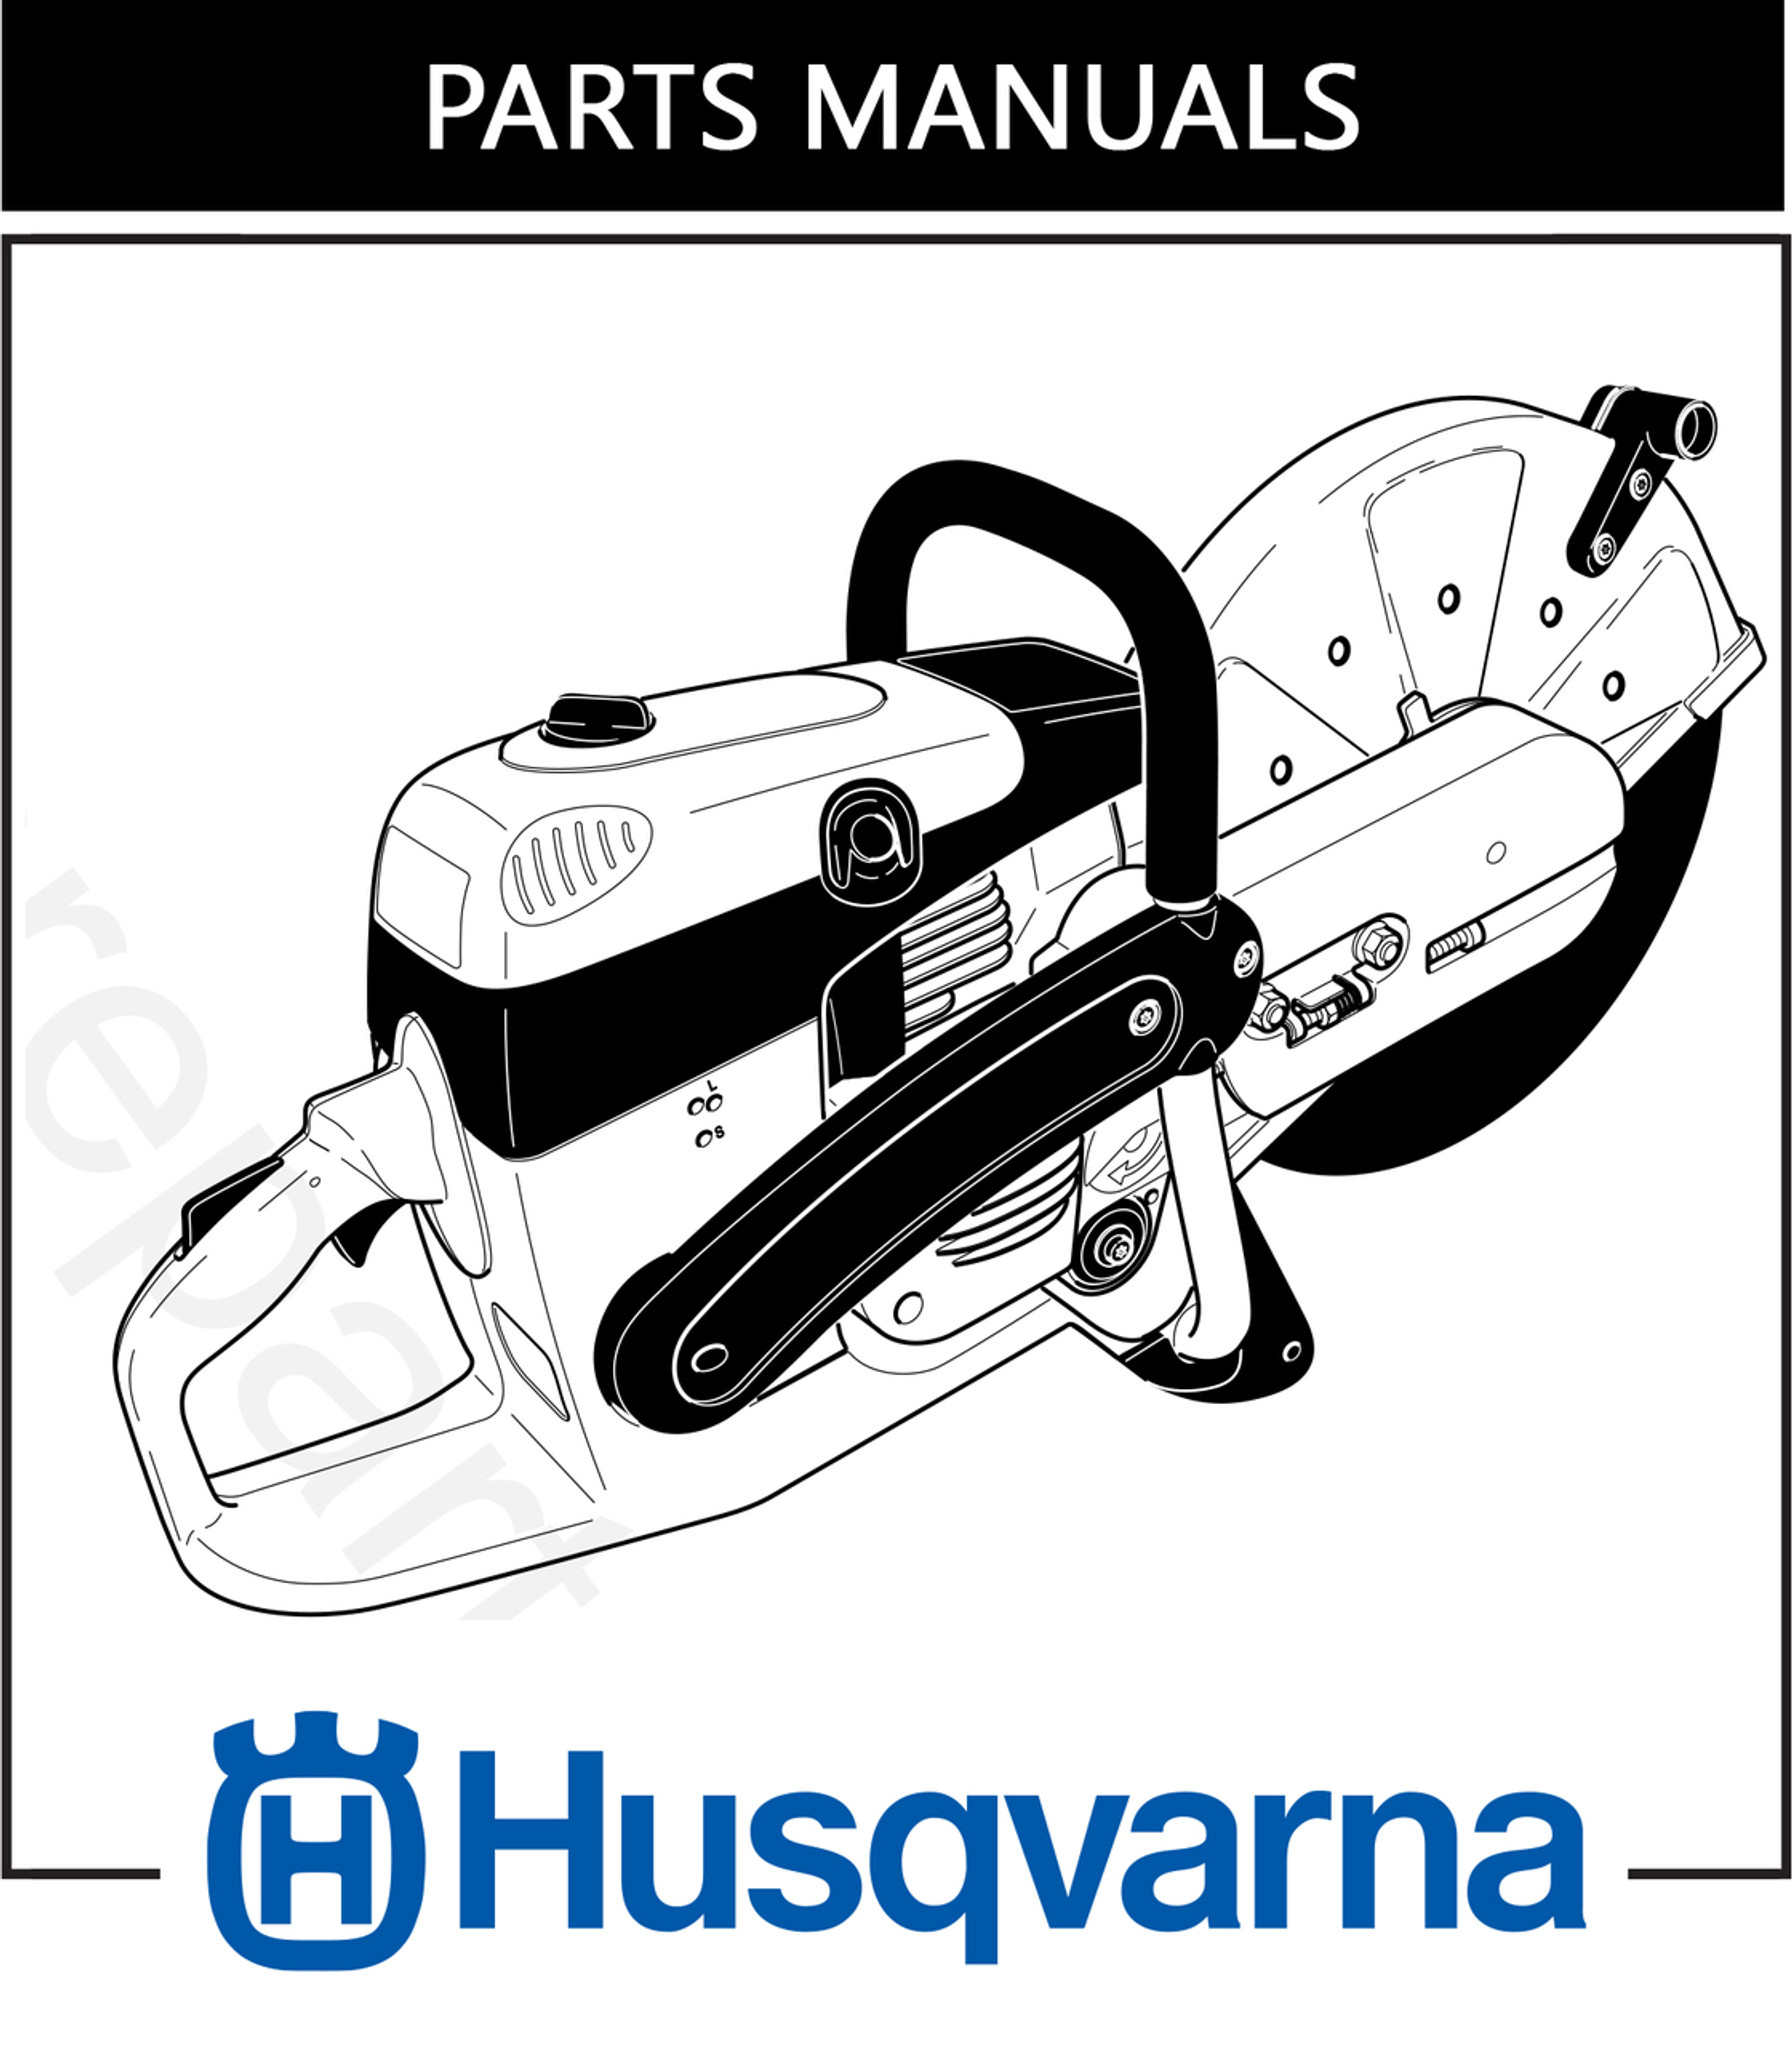 Parts Manual | Husqvarna K750 | Free Download - DHS Equipment